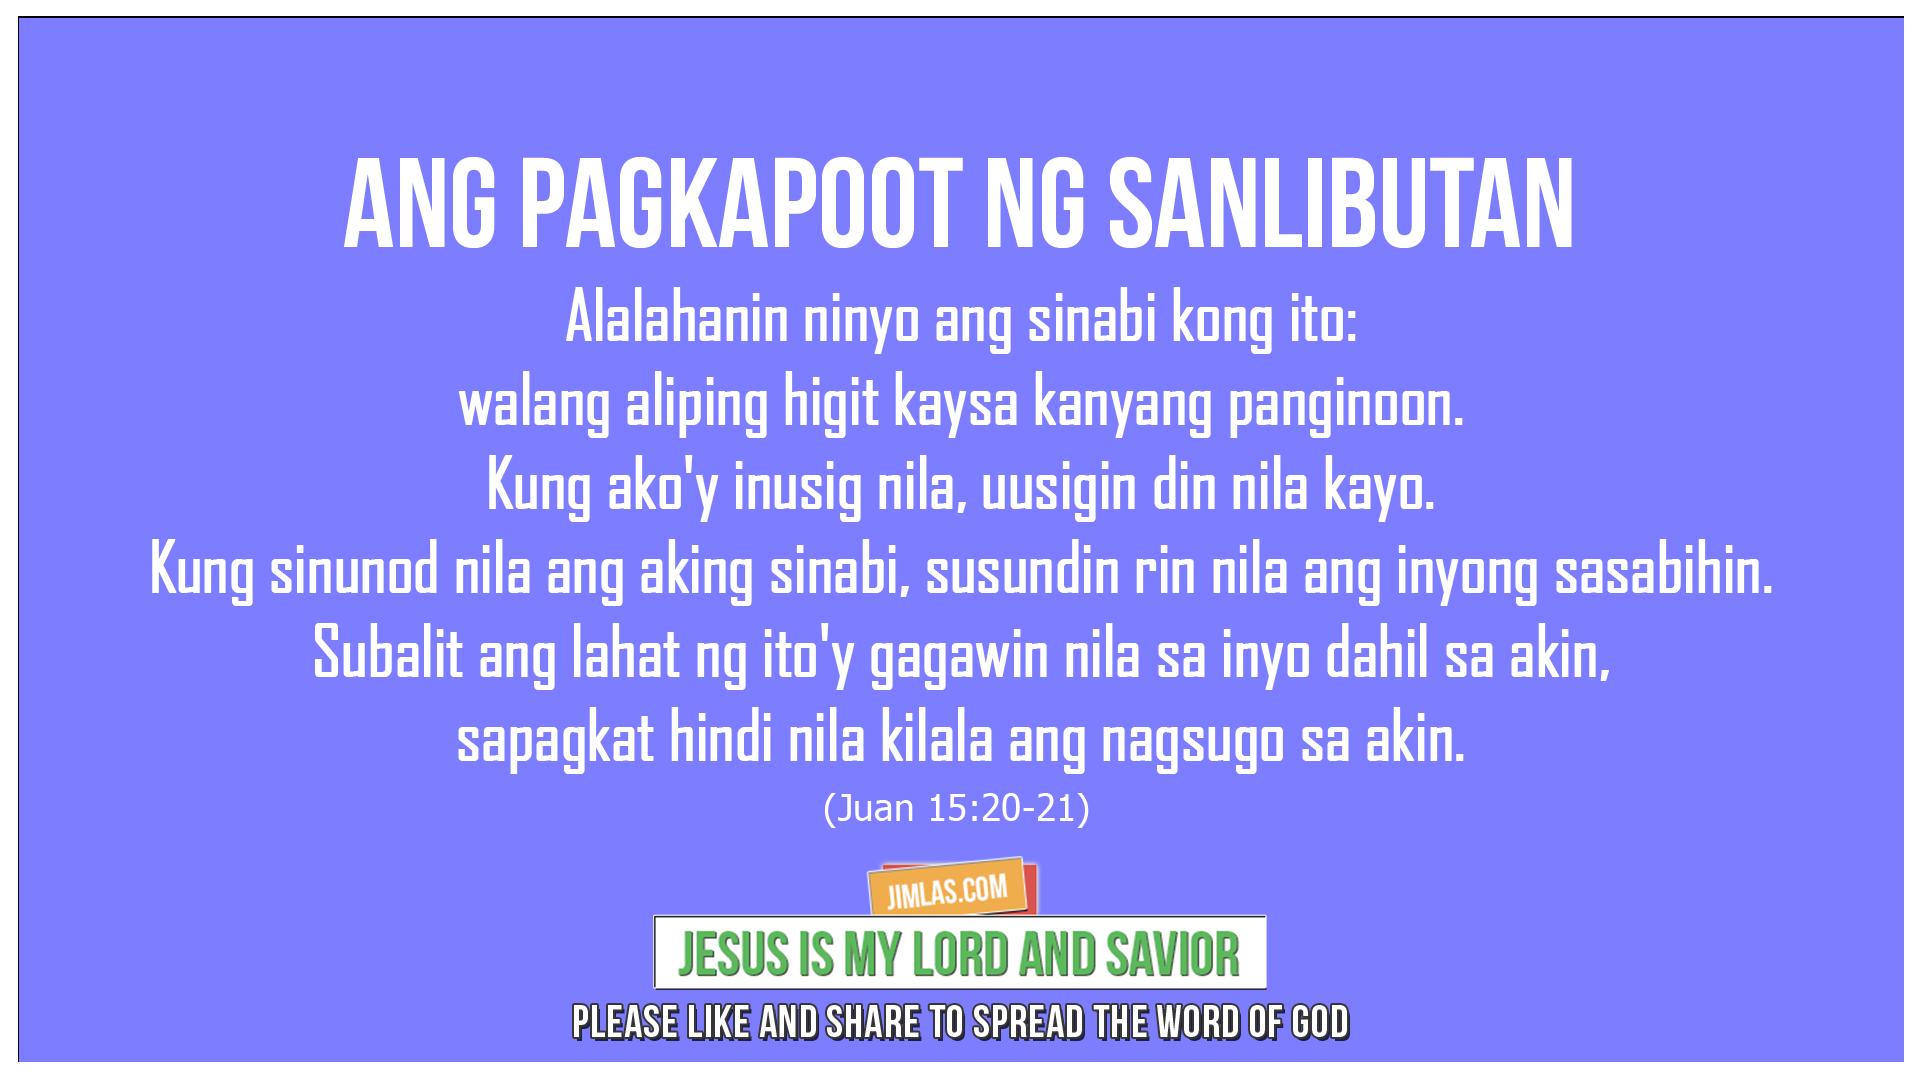 Juan 15 20-21, Juan 15:20-21